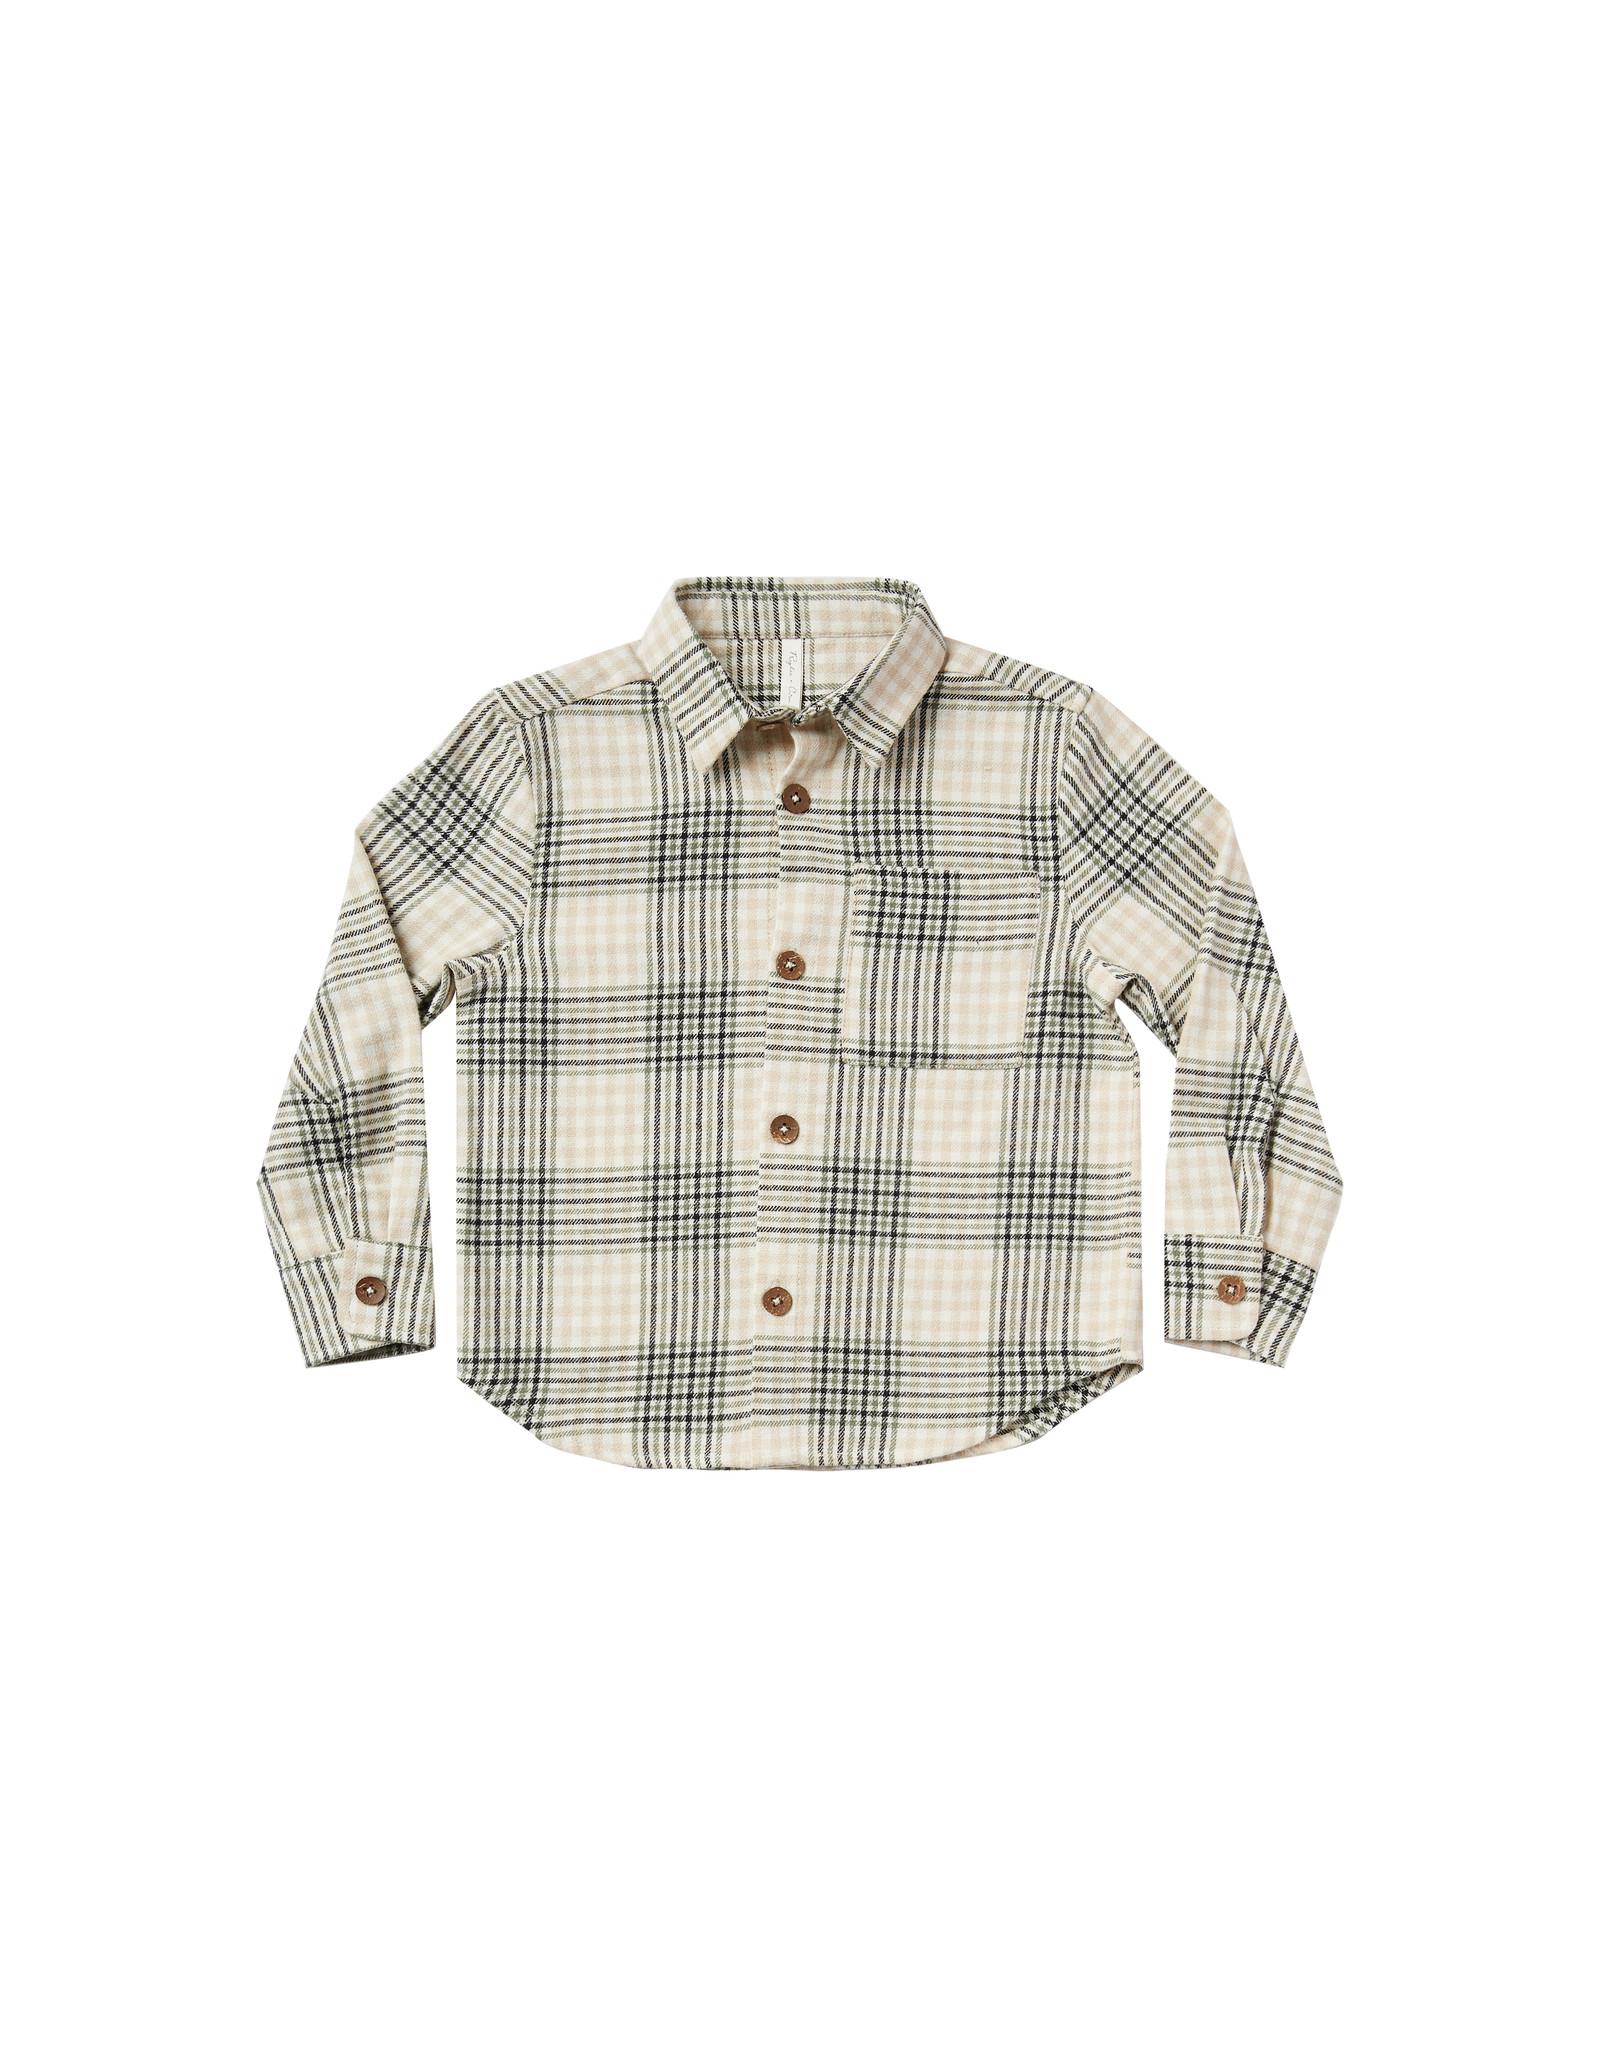 Rylee + Cru Flannel Collared Shirt